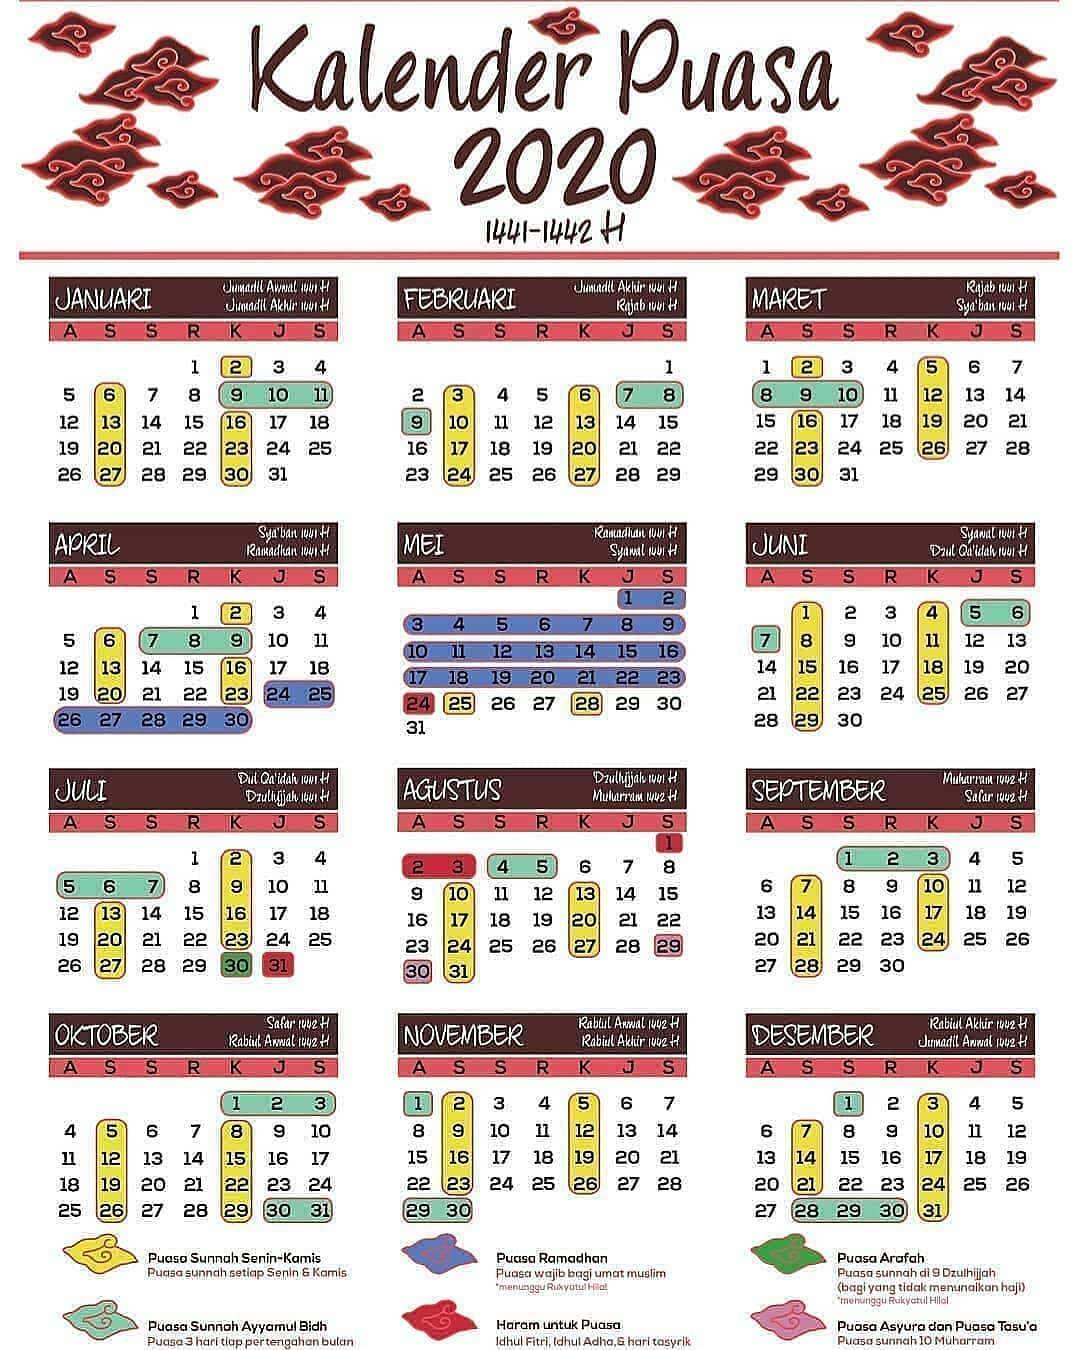 Puasa Ayyamul Bidh Juli 2020 : puasa, ayyamul, Jadwal, Puasa, Sunah,, Wajib,, Ayyamul, Bidh,, Ramadhan, Lengkap, Tanggal, Mbakyanti